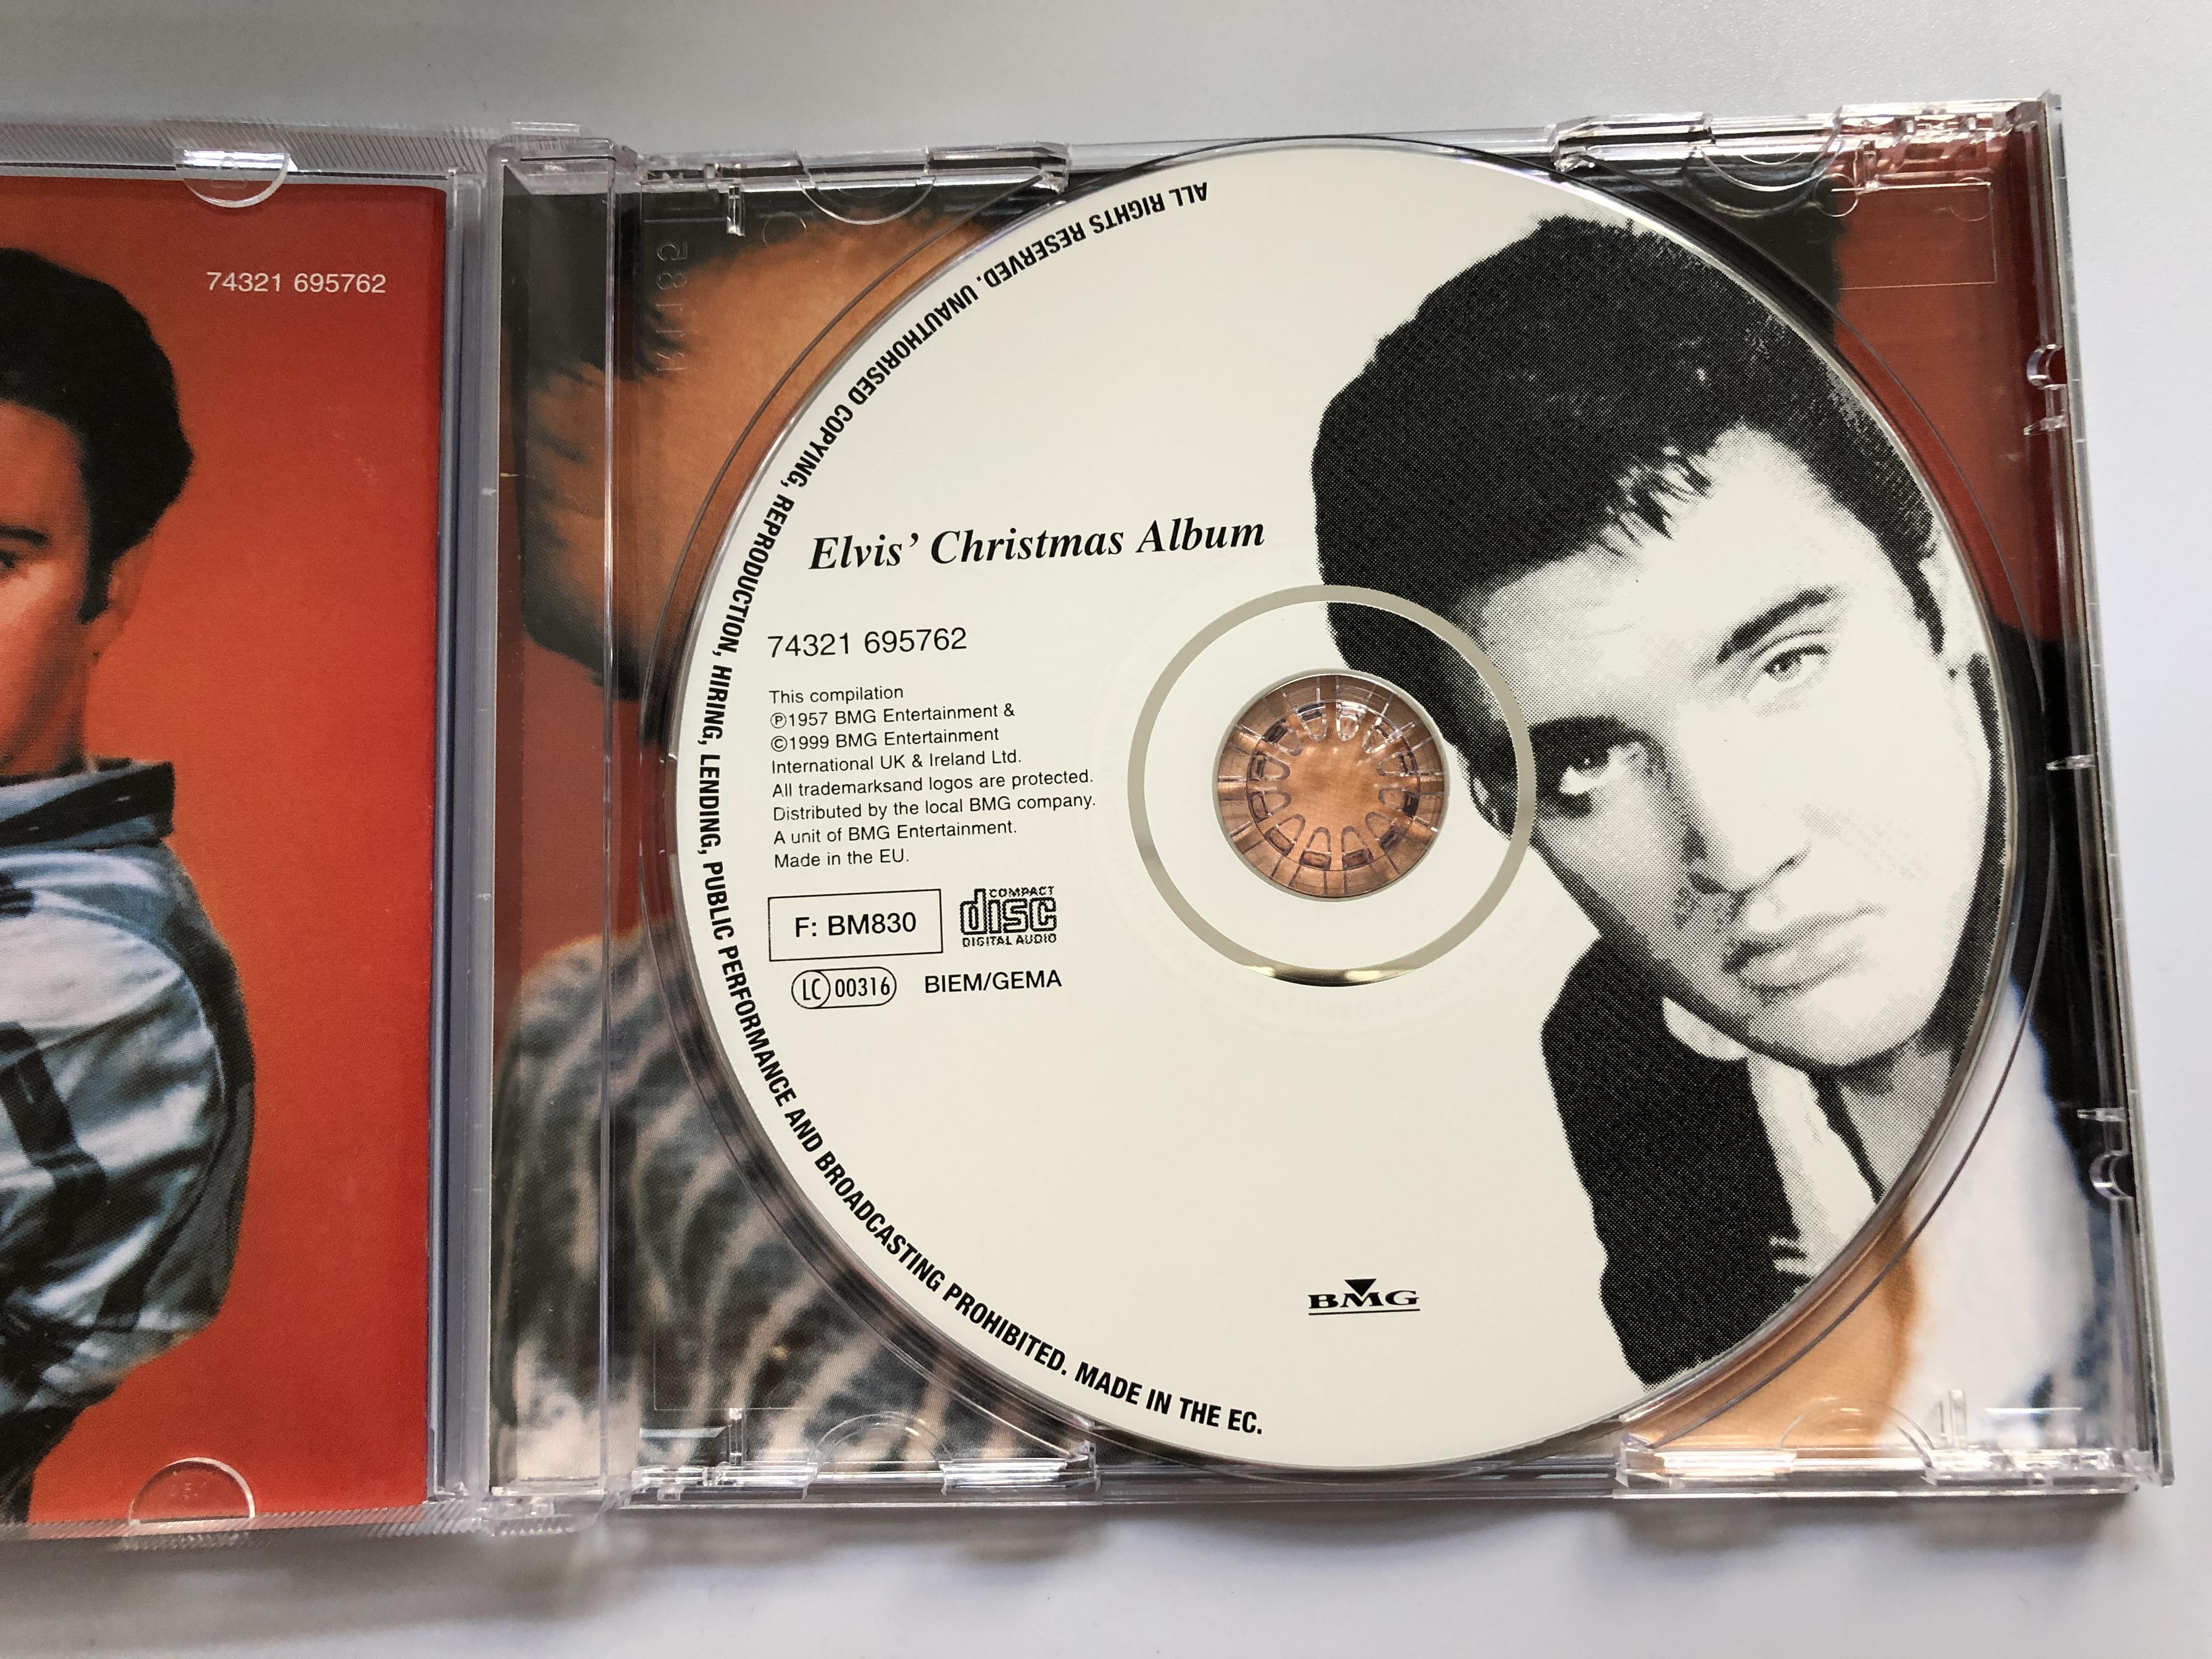 elvis-christmas-album-plus-a-booklet-of-full-colour-photos-bmg-audio-cd-1999-74321-695762-8-.jpg